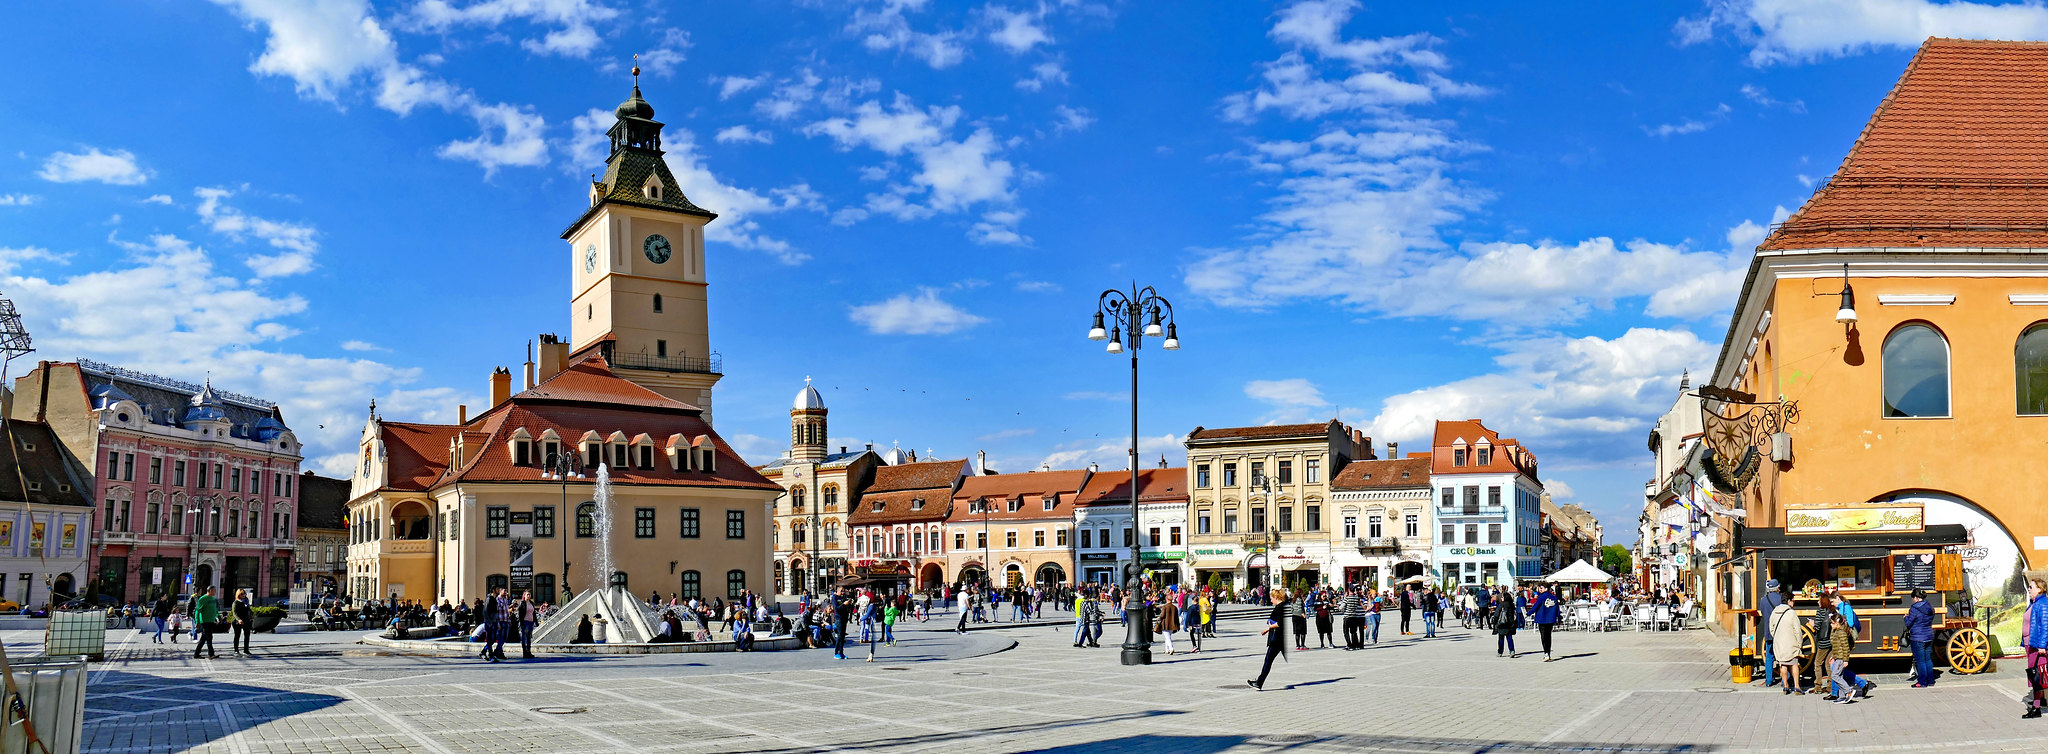 kelione i rumunija